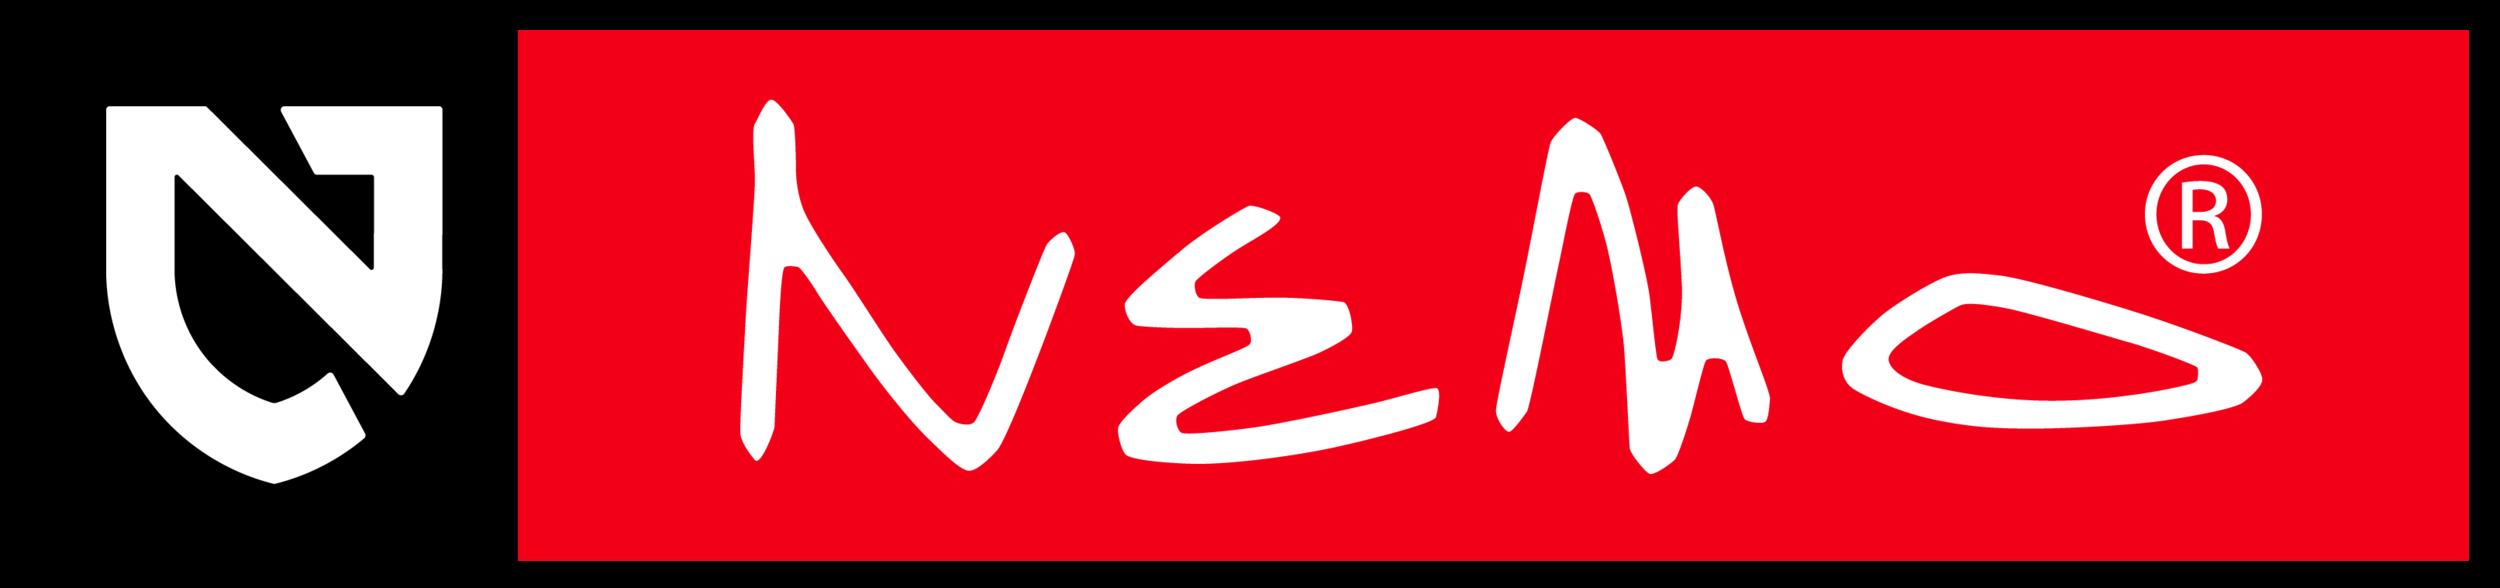 company-641-logo.png